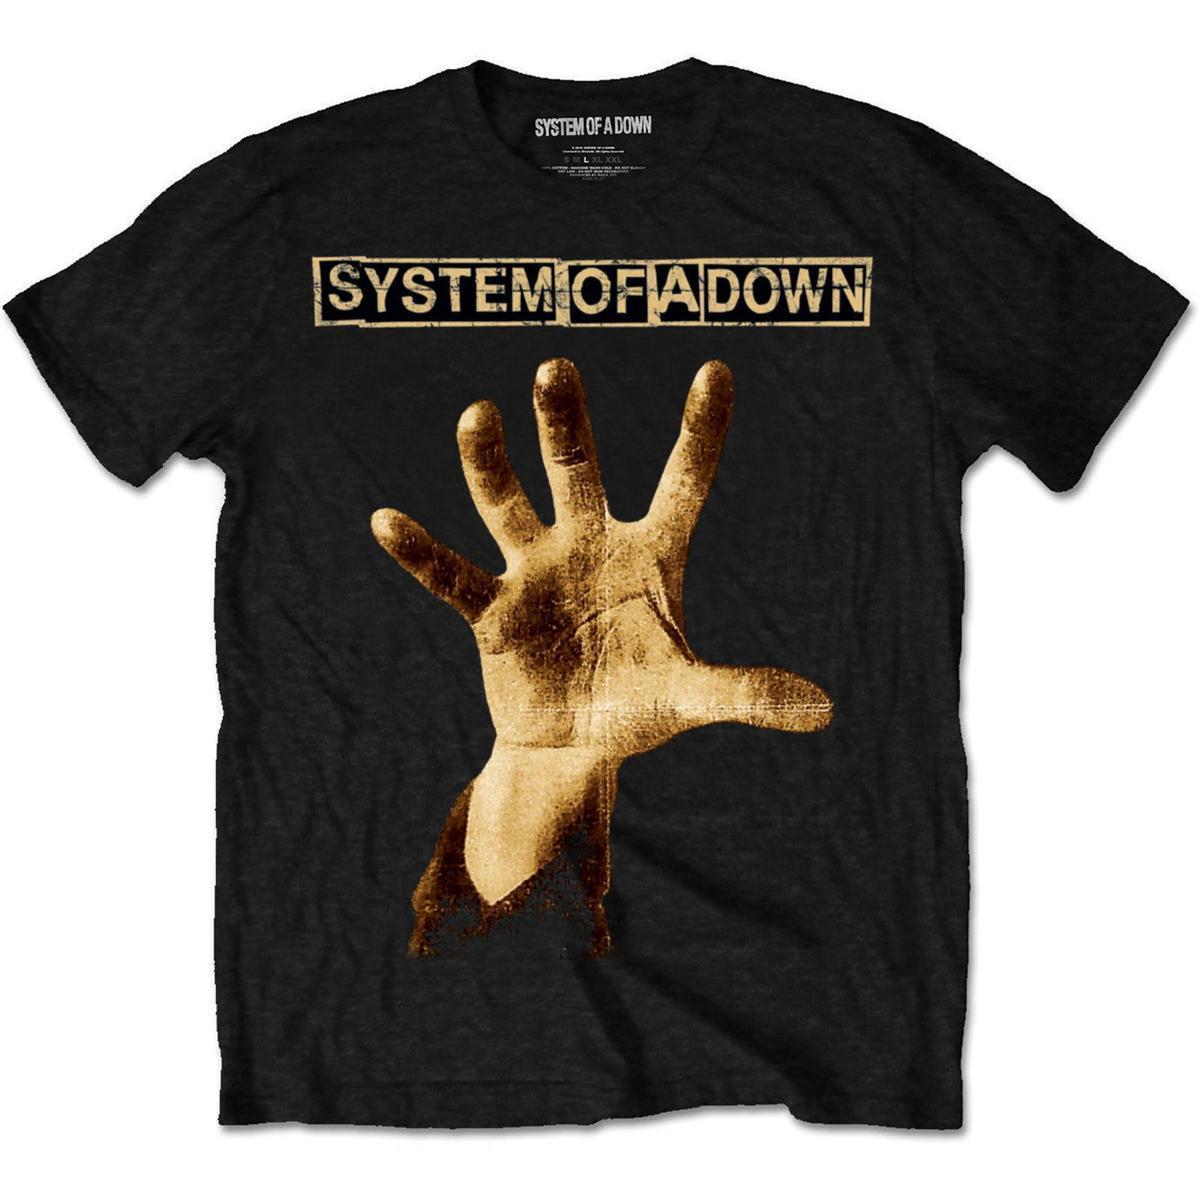 System Of A Down T Shirt SOAD Album Cover Festival Disturbed Slipknot Korn